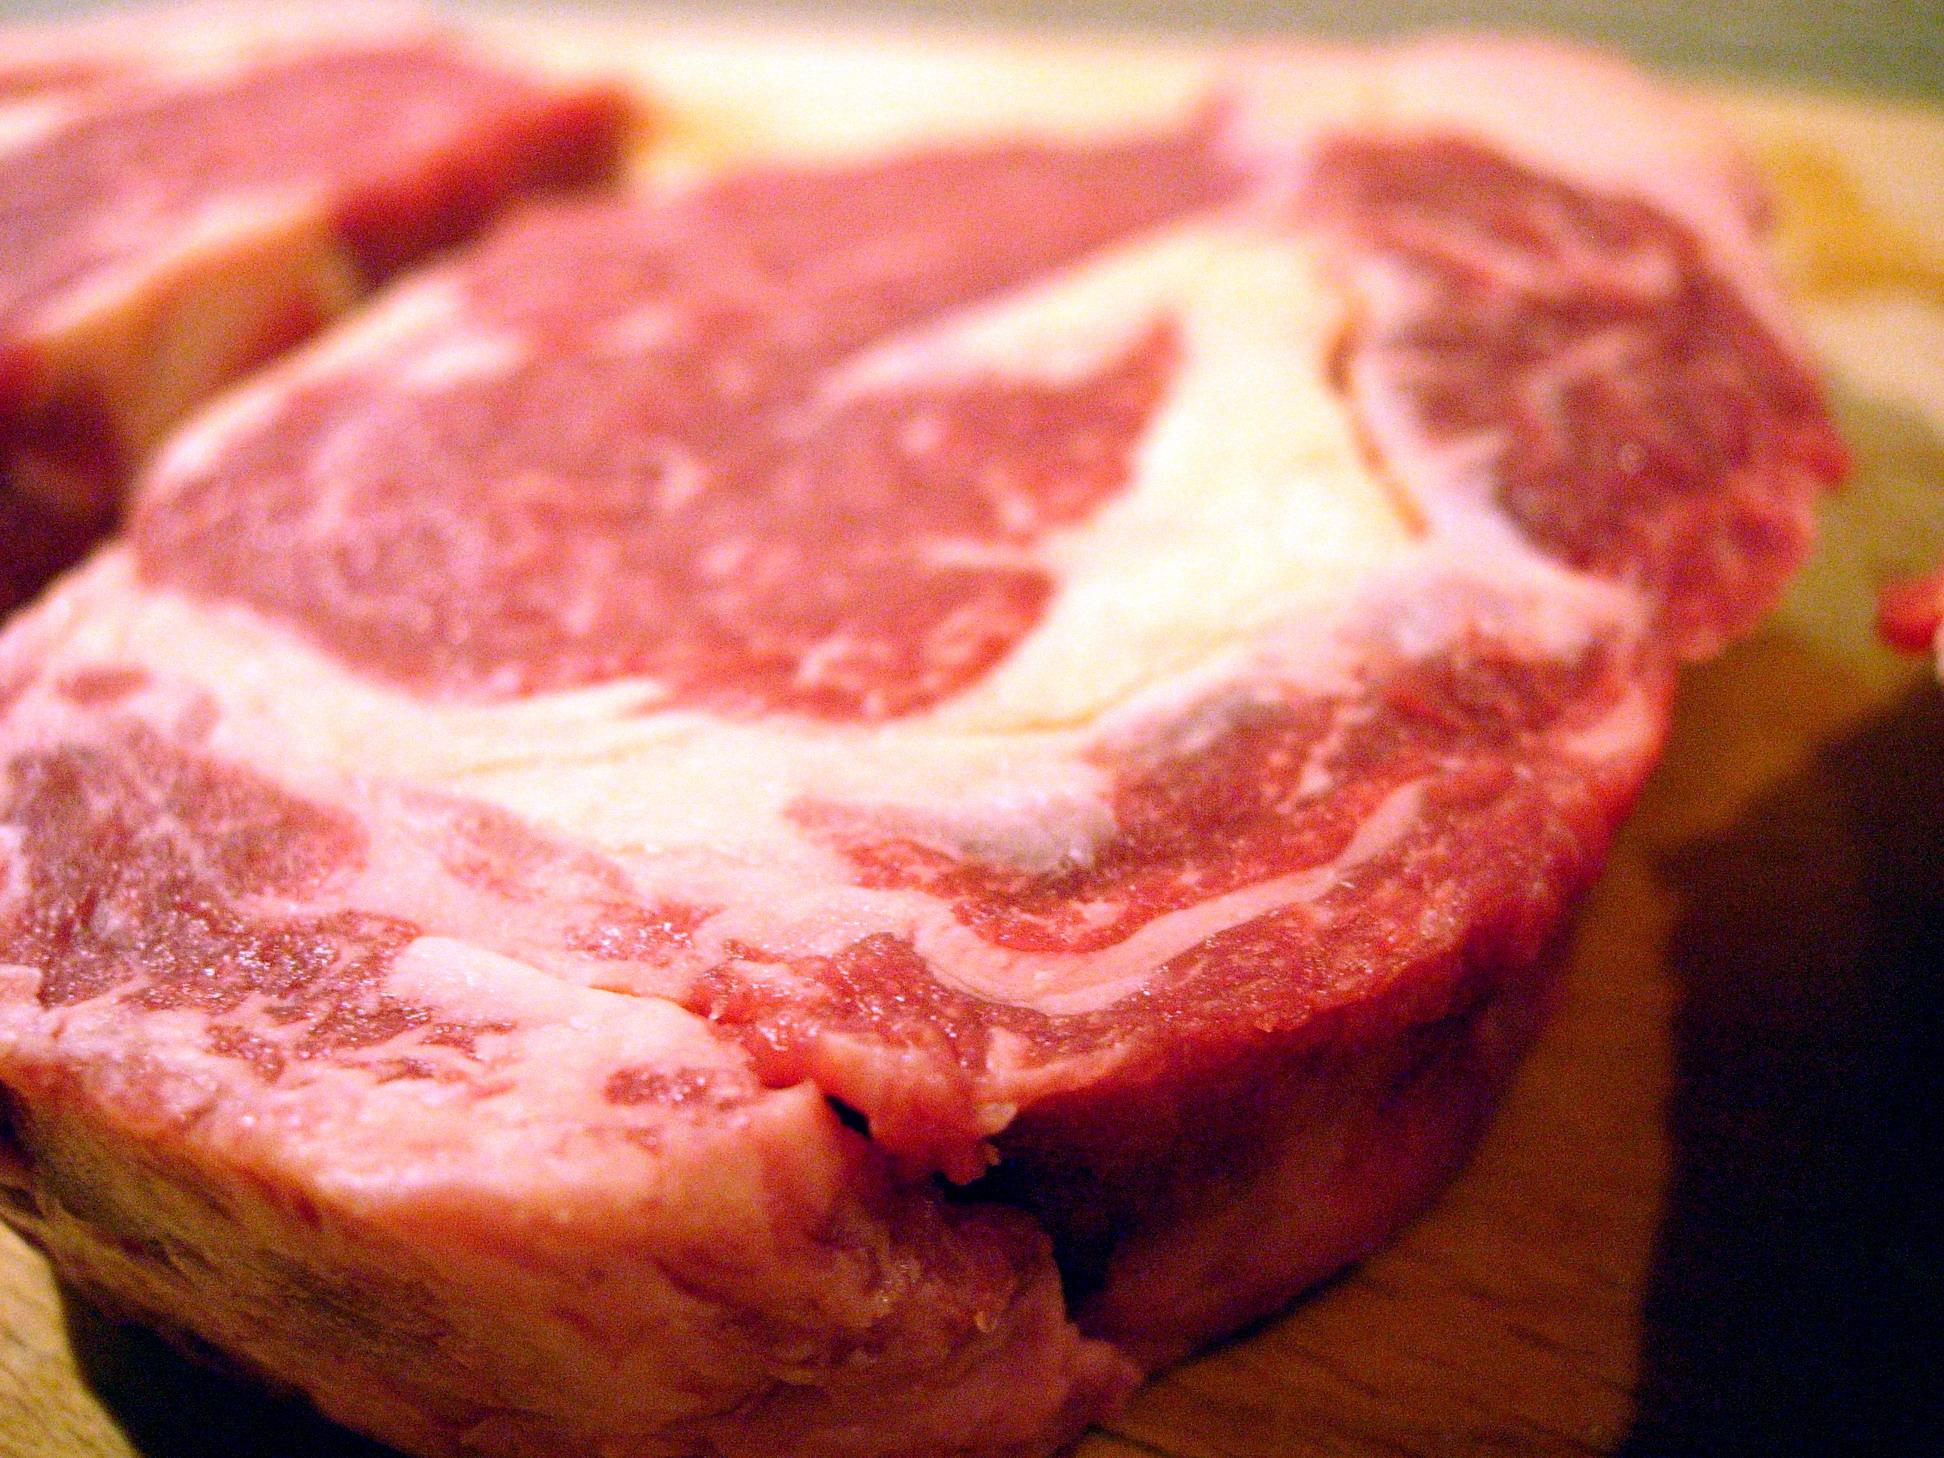 grillad rostbiff kcal